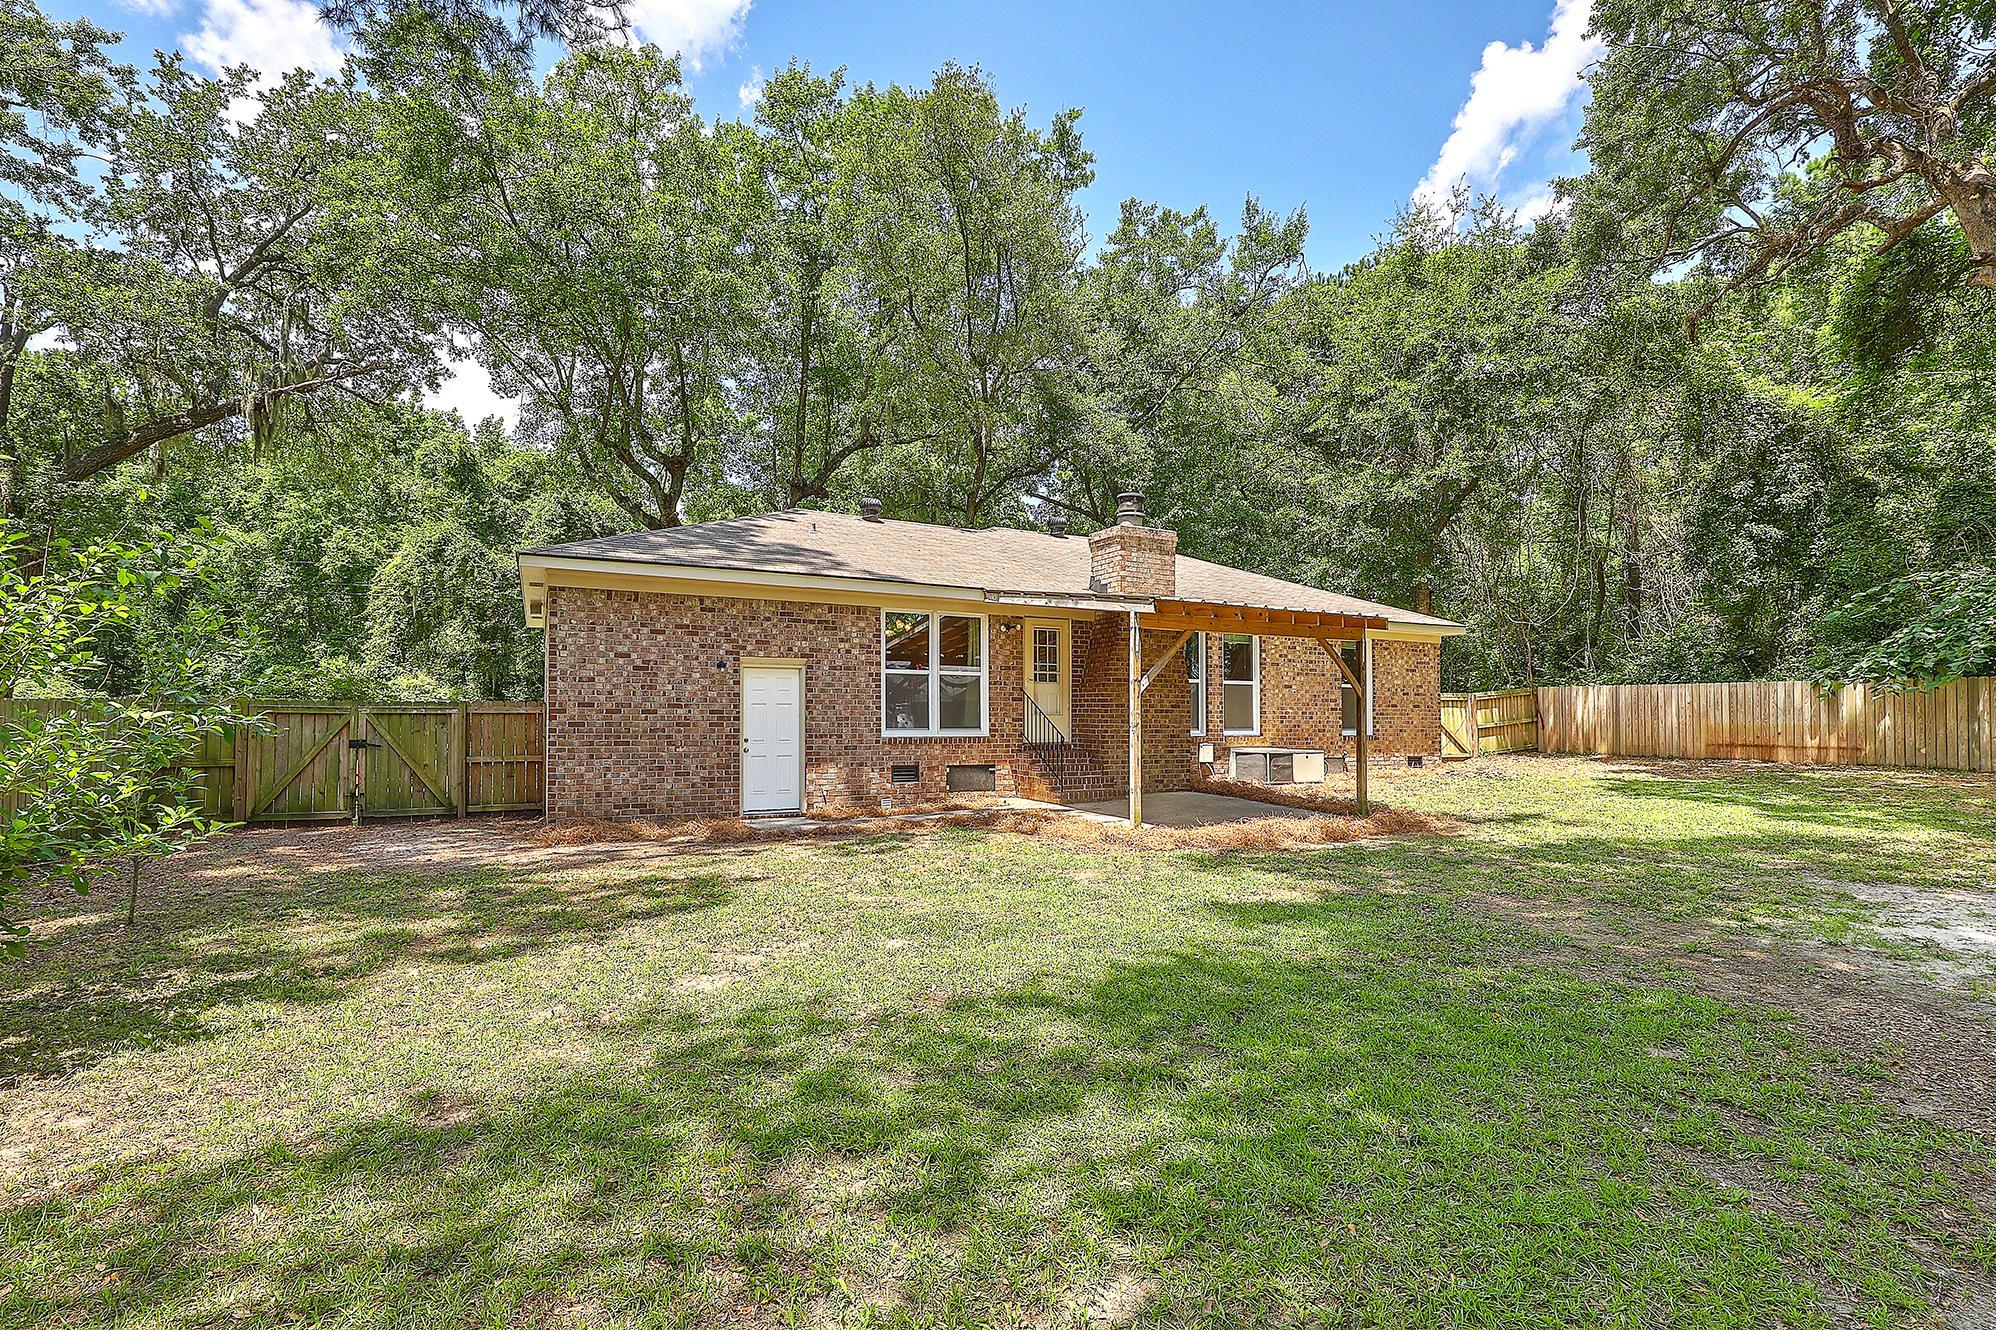 Oakland Homes For Sale - 344 Shore, Charleston, SC - 17